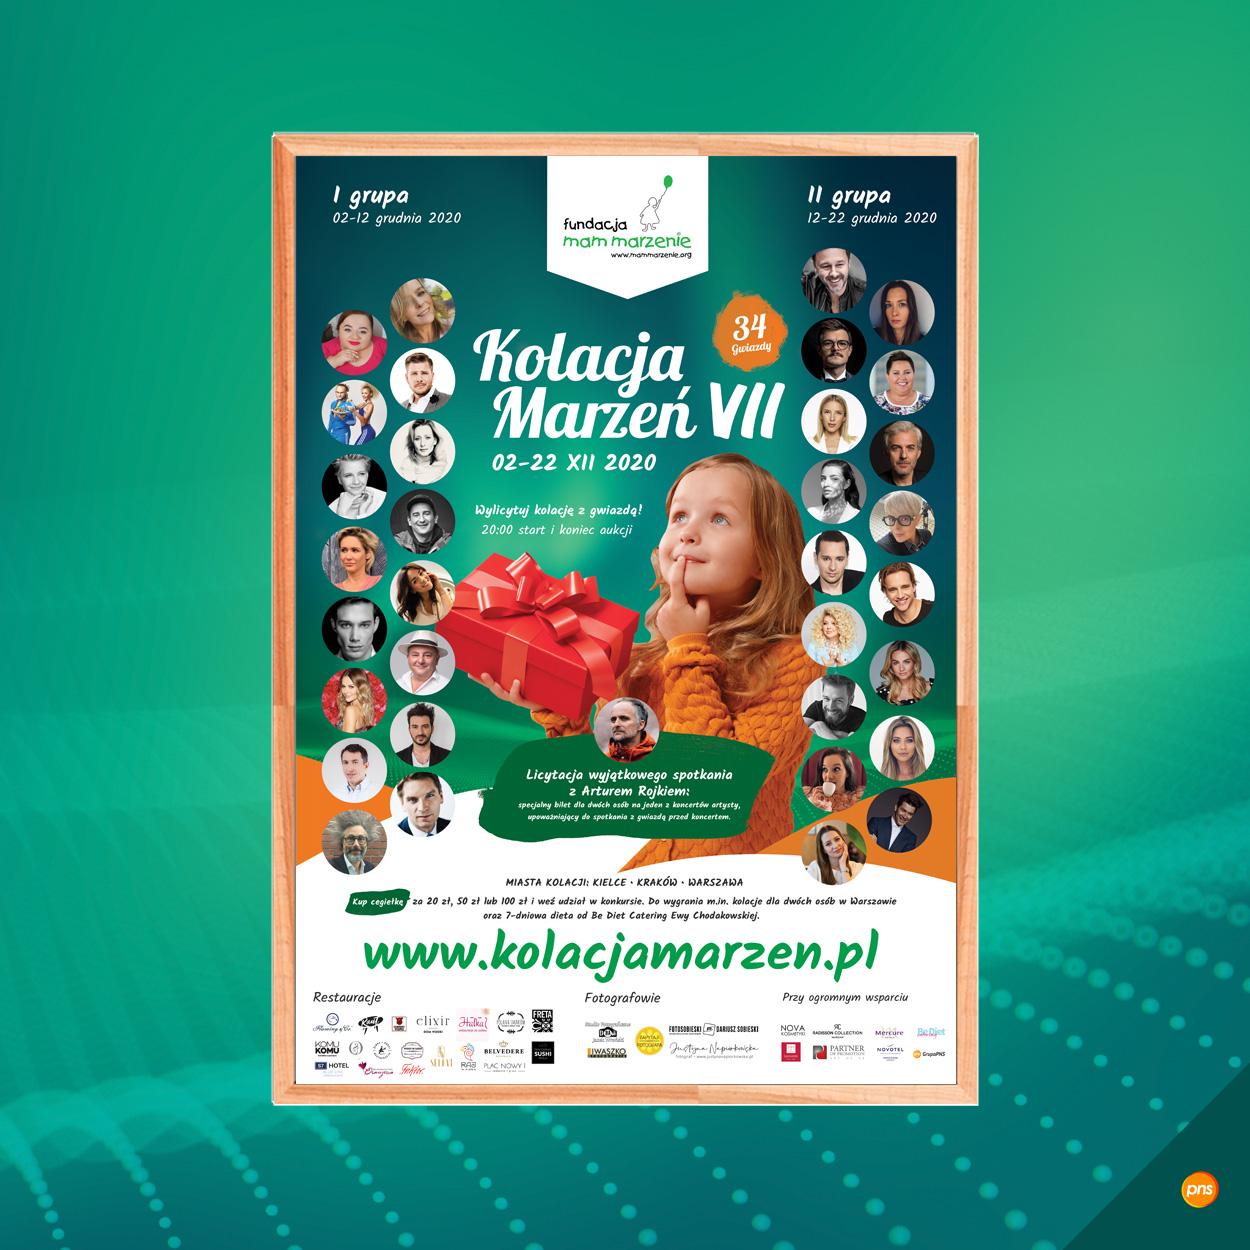 projekt plakatu event kolacja marzen 2020 - Projekt plakatu na wydarzenie - Kolacja Marzeń VII